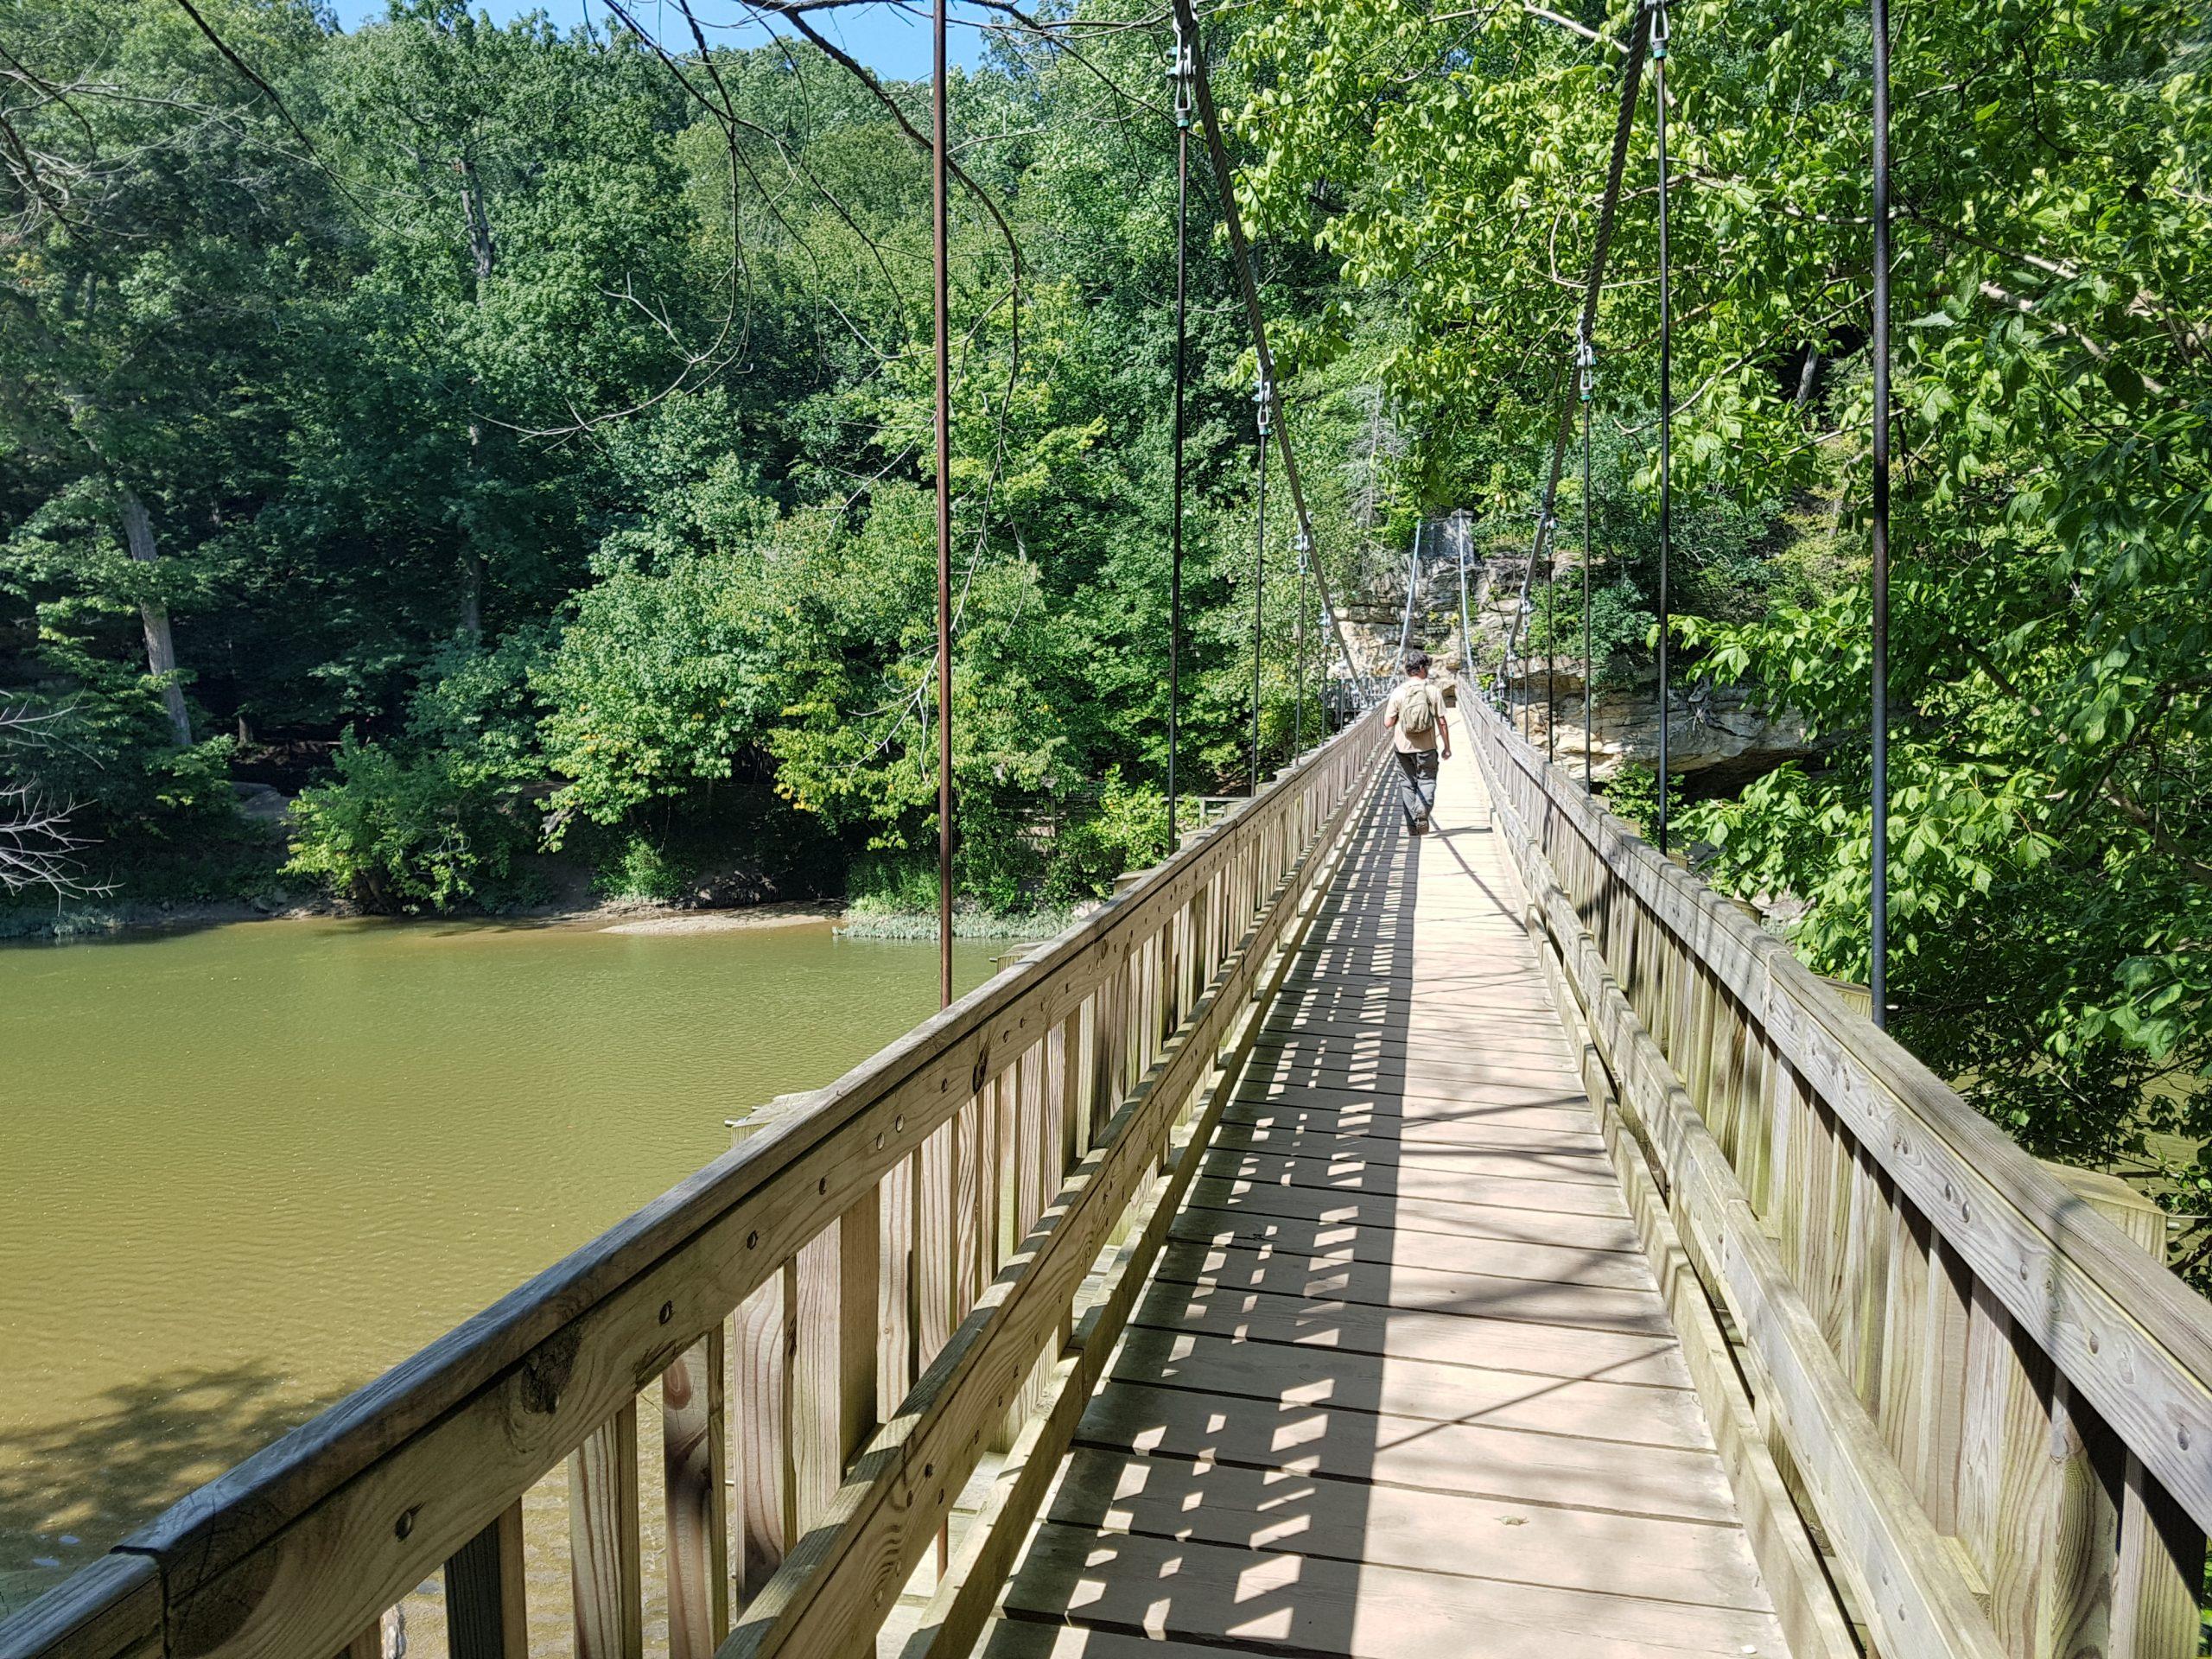 Suspension Bridge at Turkey Run State Park